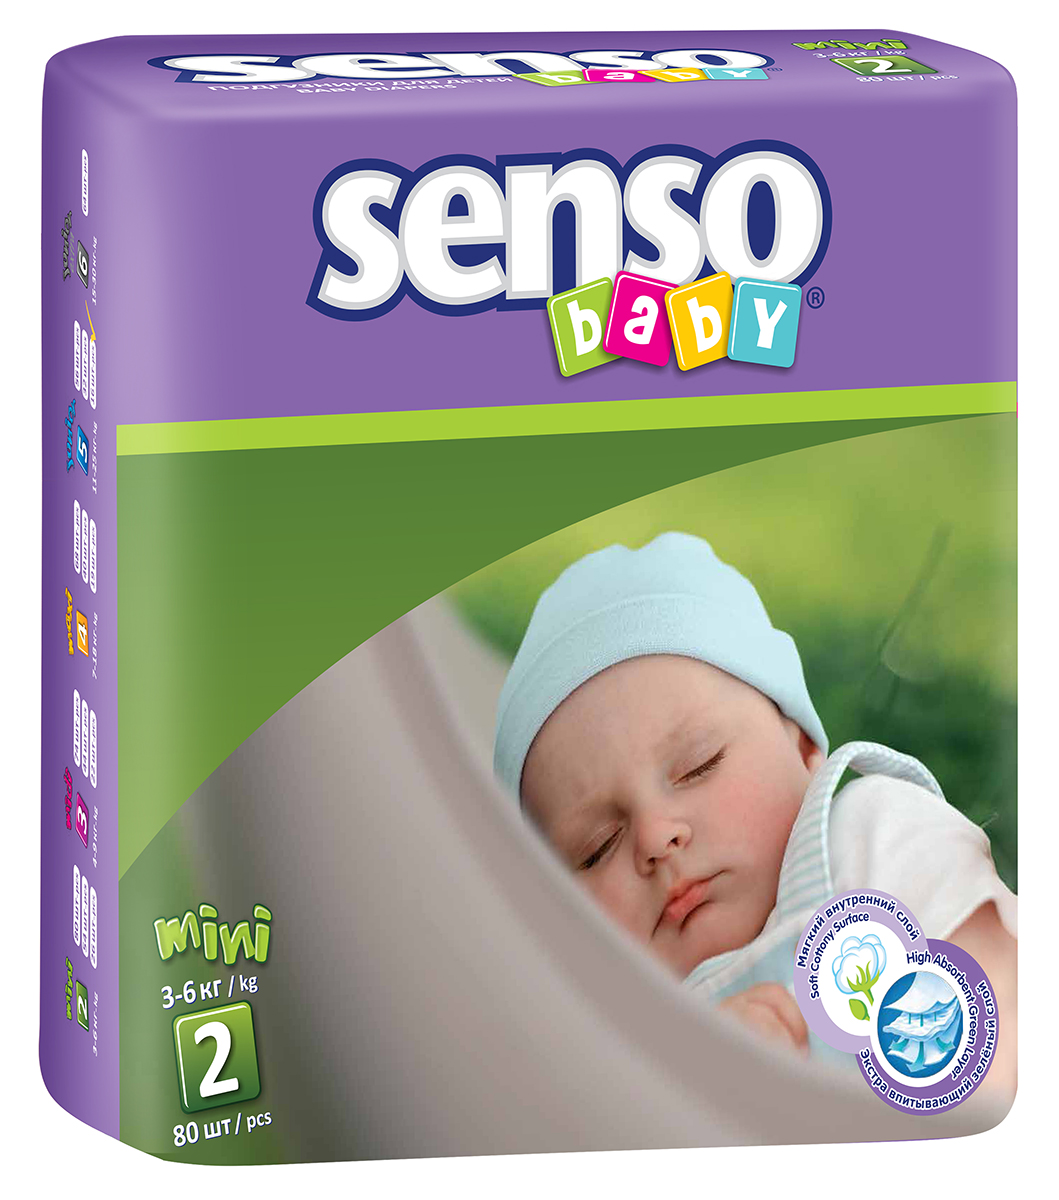 Senso Baby Подгузники Mini 3-6 кг 80 шт - Подгузники и пеленки